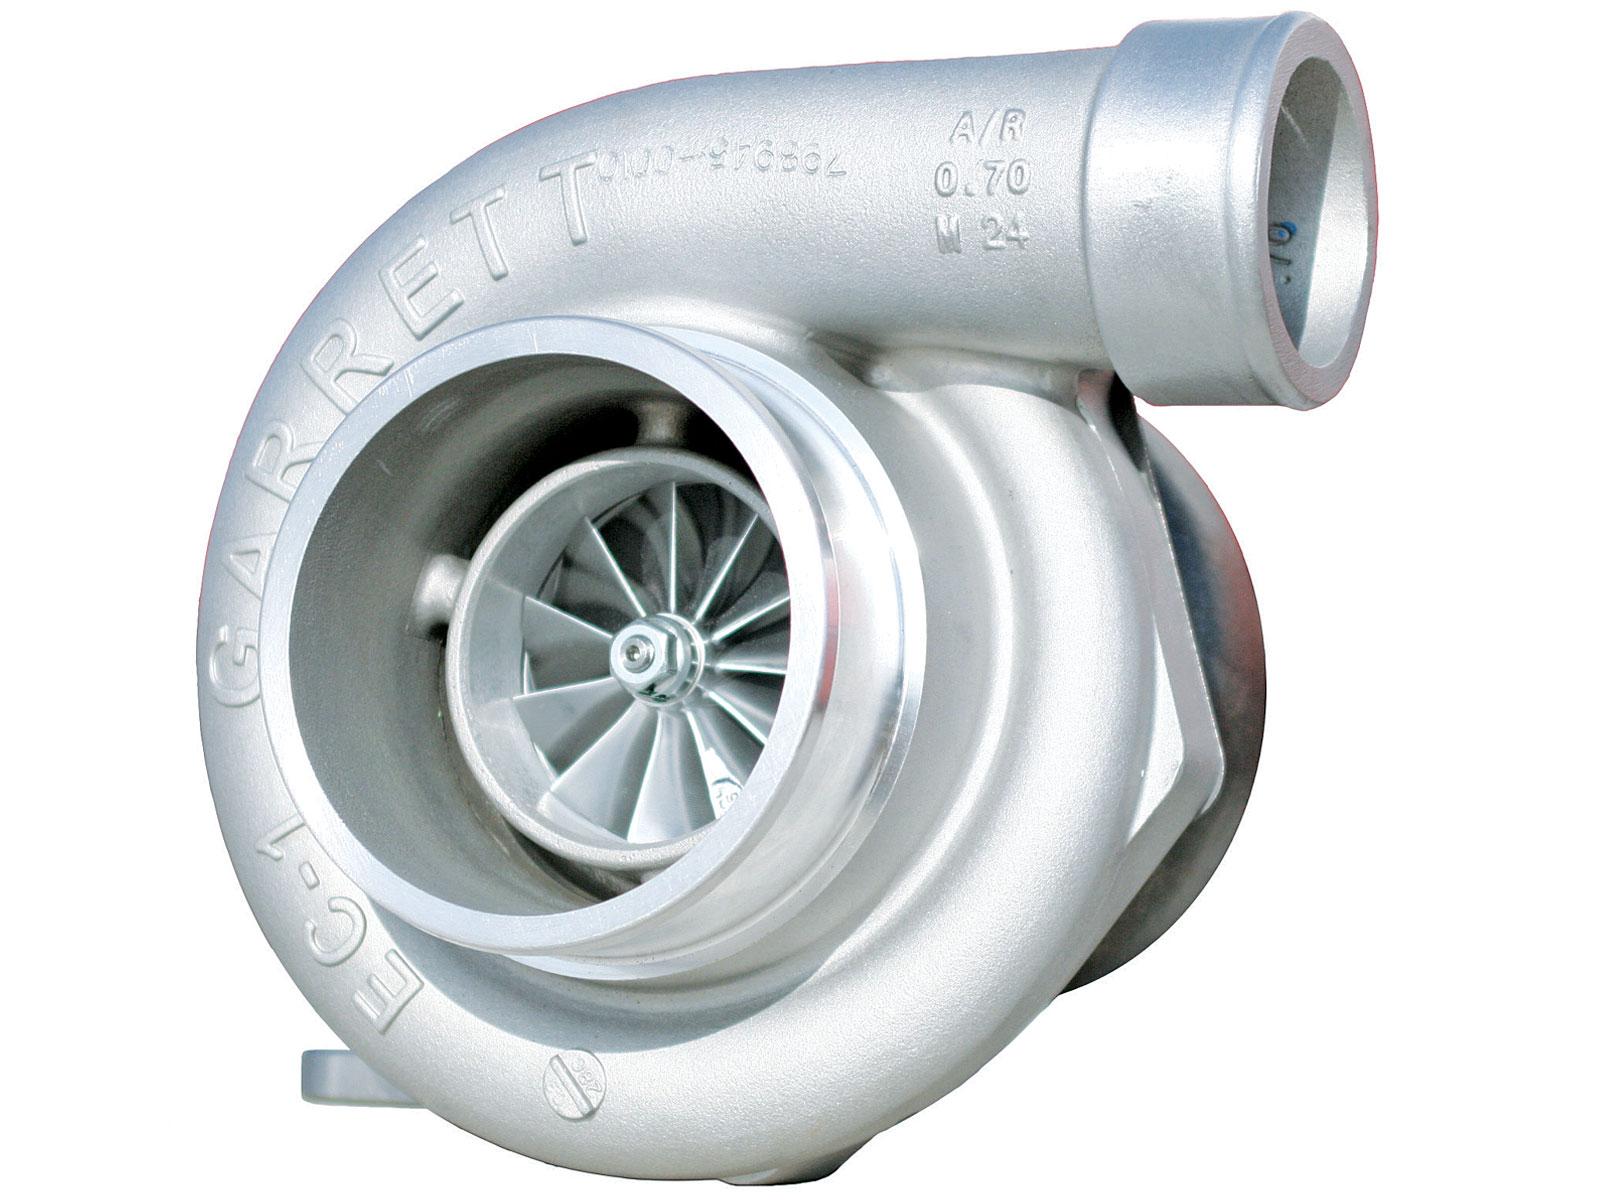 sstp_1102_01_ohoneywell_turbo_technologiesgarrett_gtx_turbos